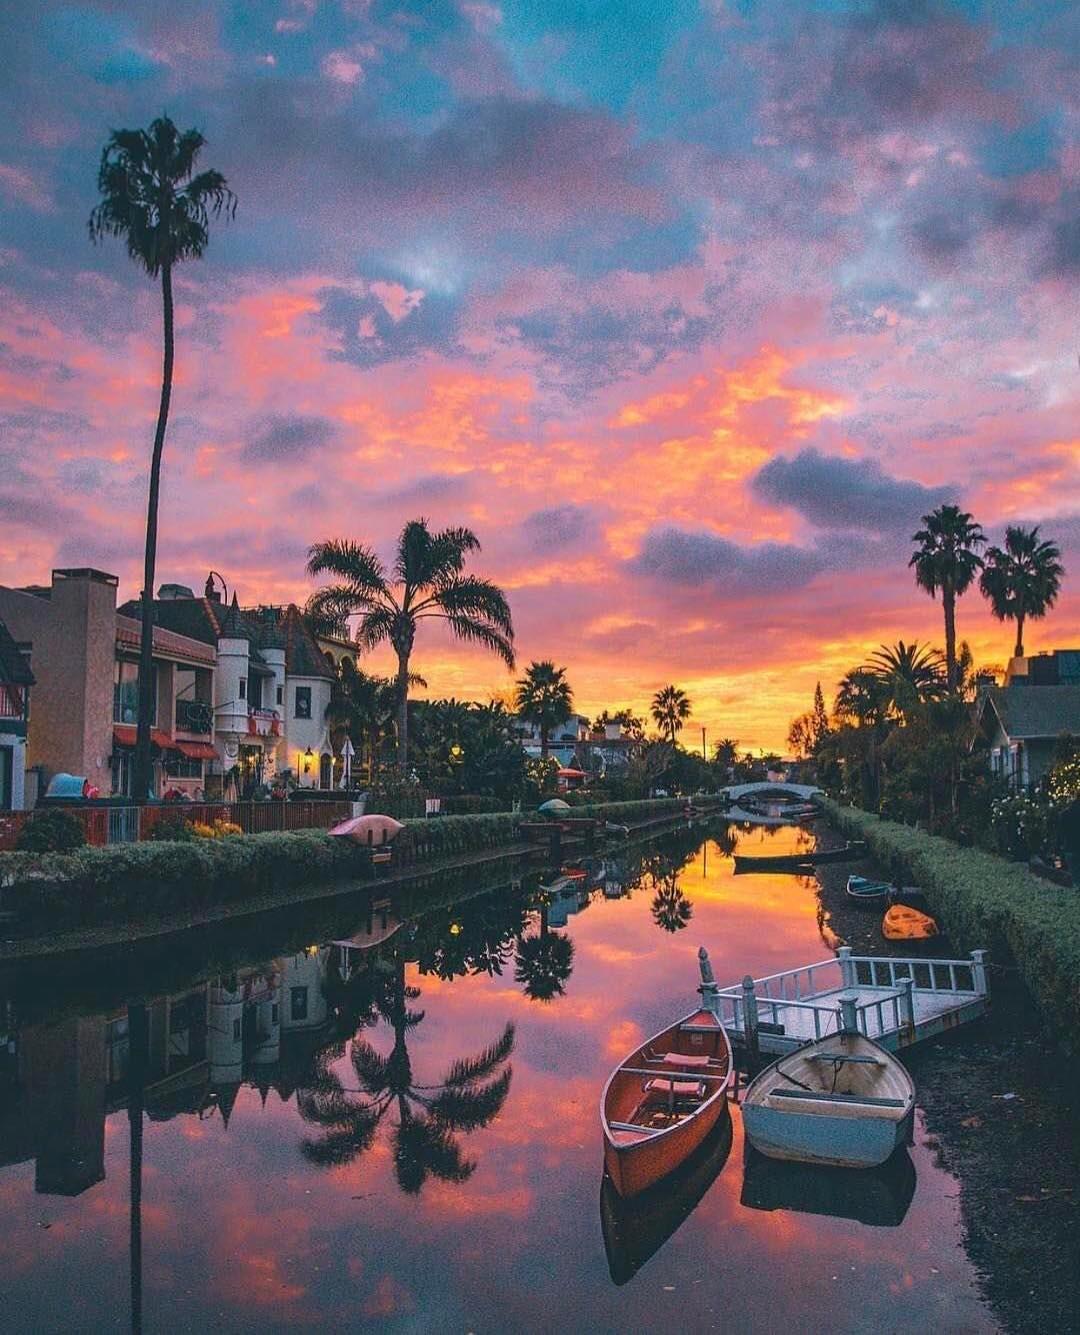 Venice Beach canal, California